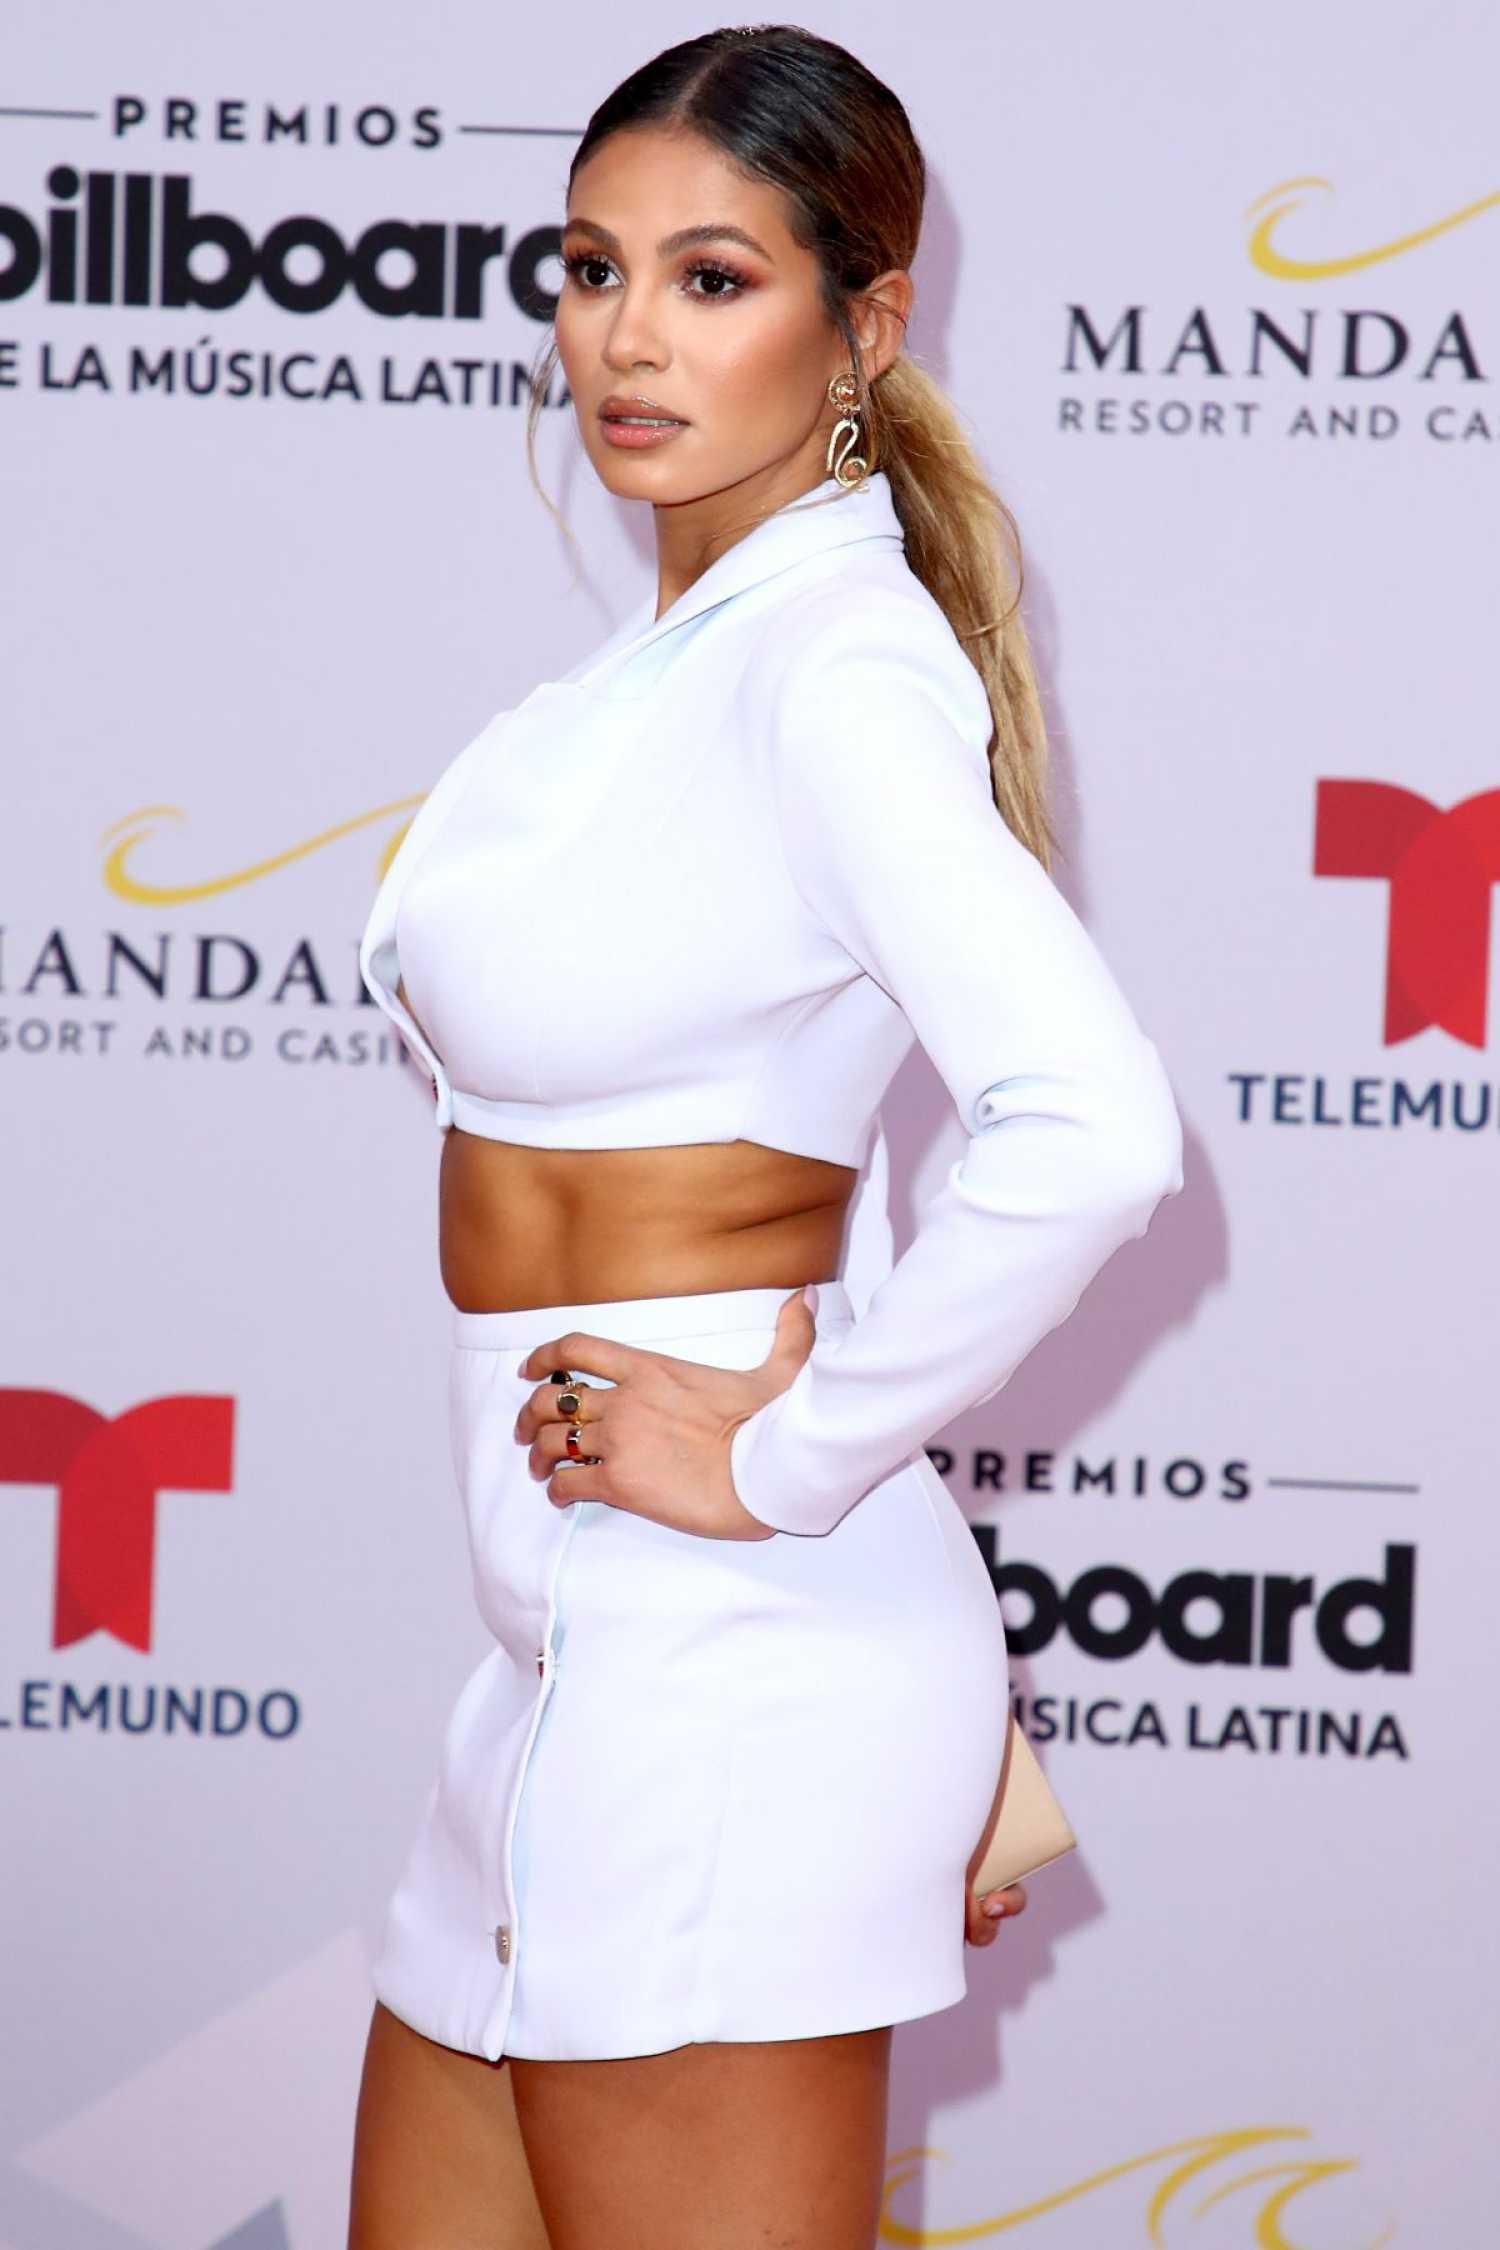 greice santo attends 2019 billboard latin music awards in